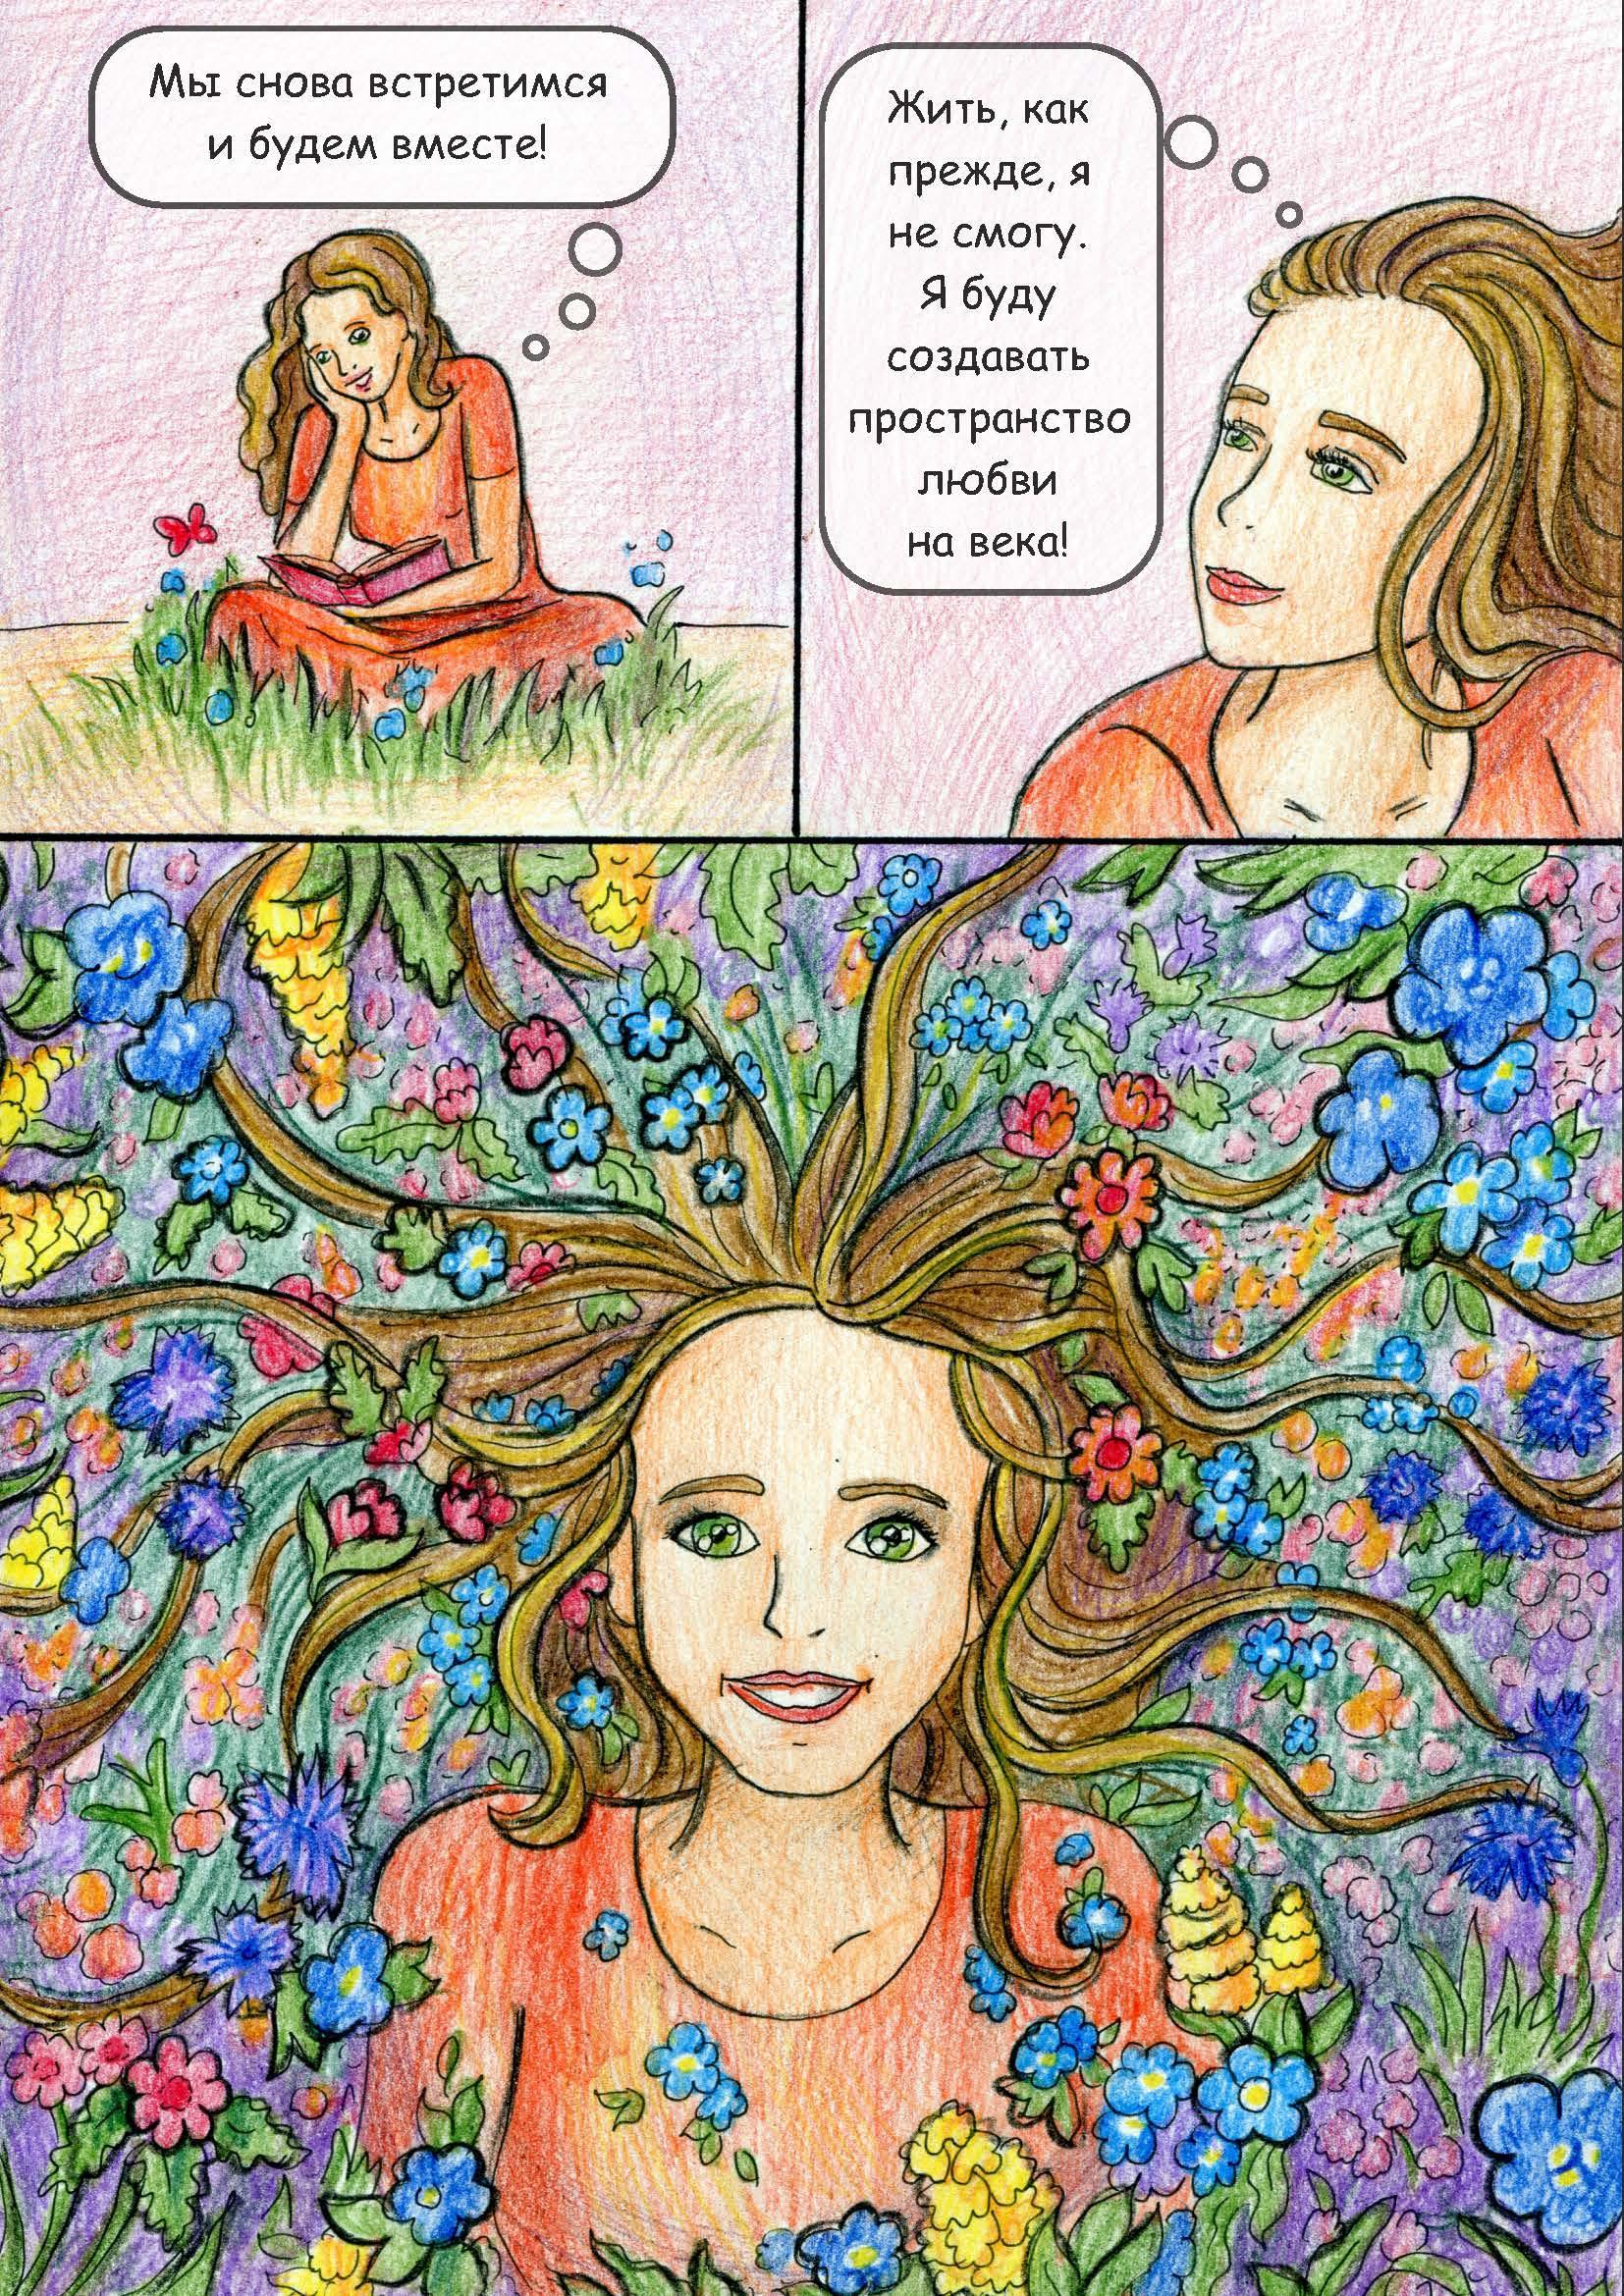 Анна Гейдебрехт. Комикс Зовущая мечта (25).jpg